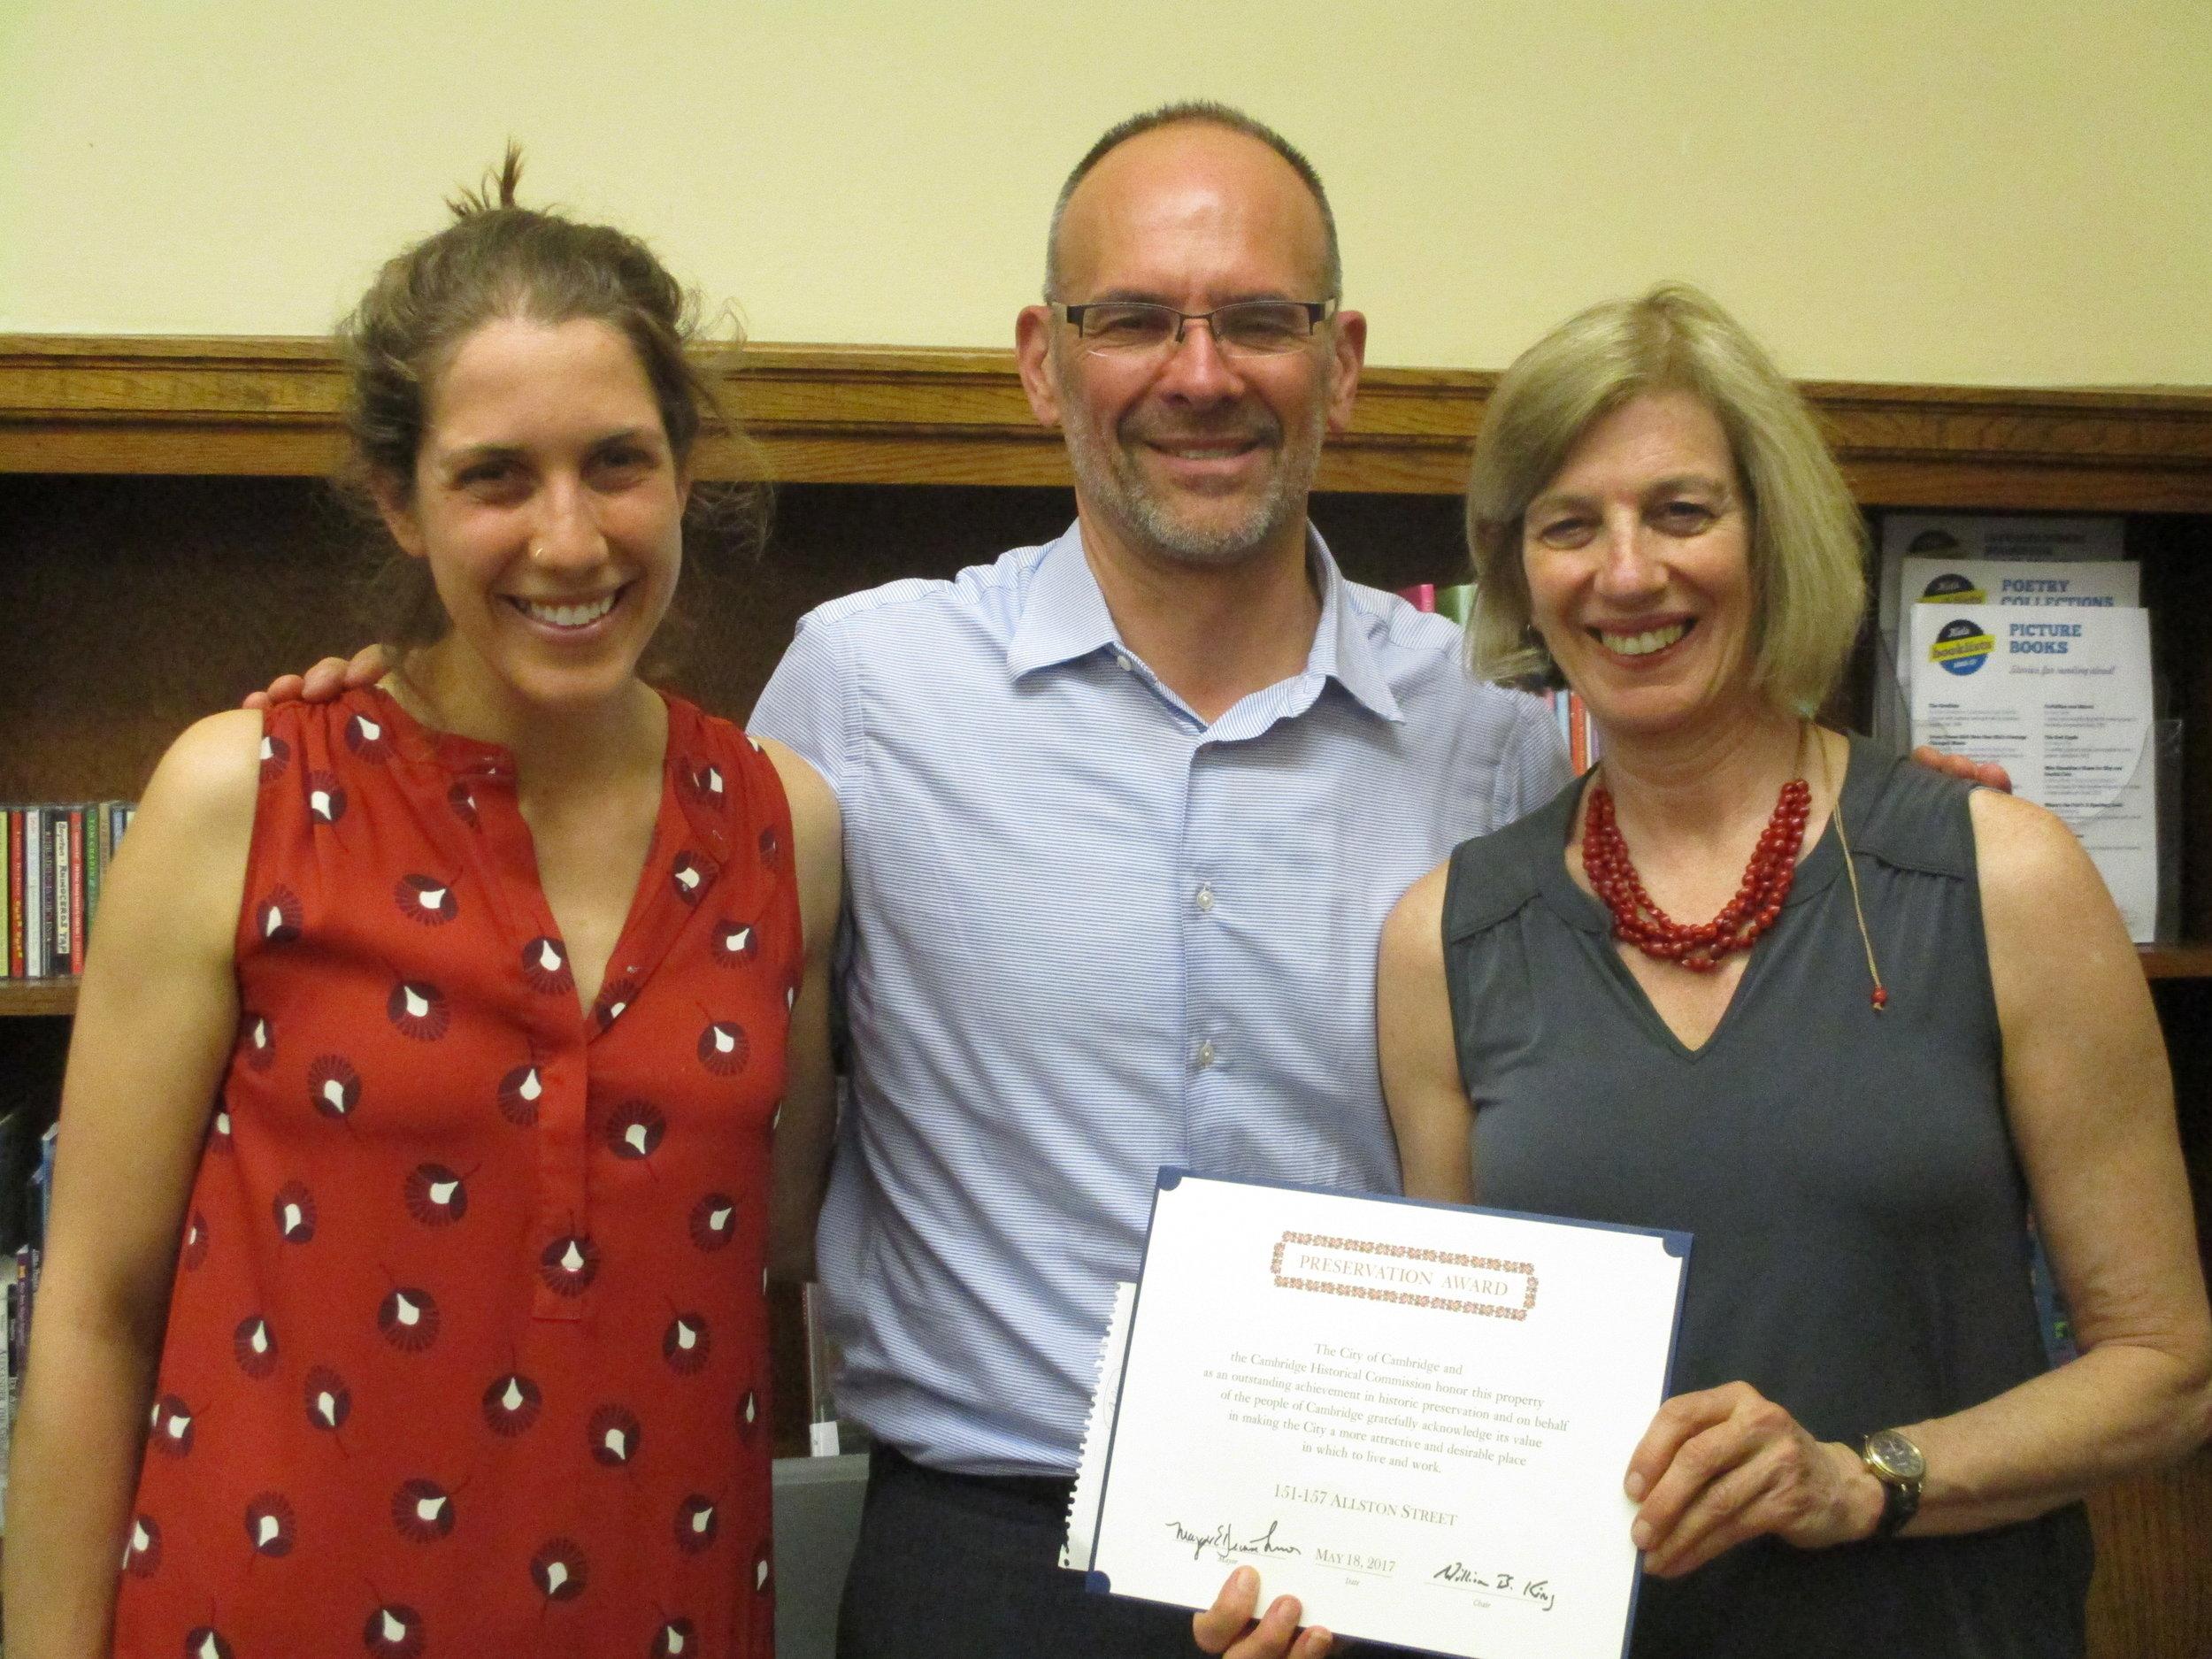 Rebecca Schofield (HRI), David Flaschenriem (TNG), and Jane Carbone (HRI) accept the Preservation Award for 151-157 Allston Street.